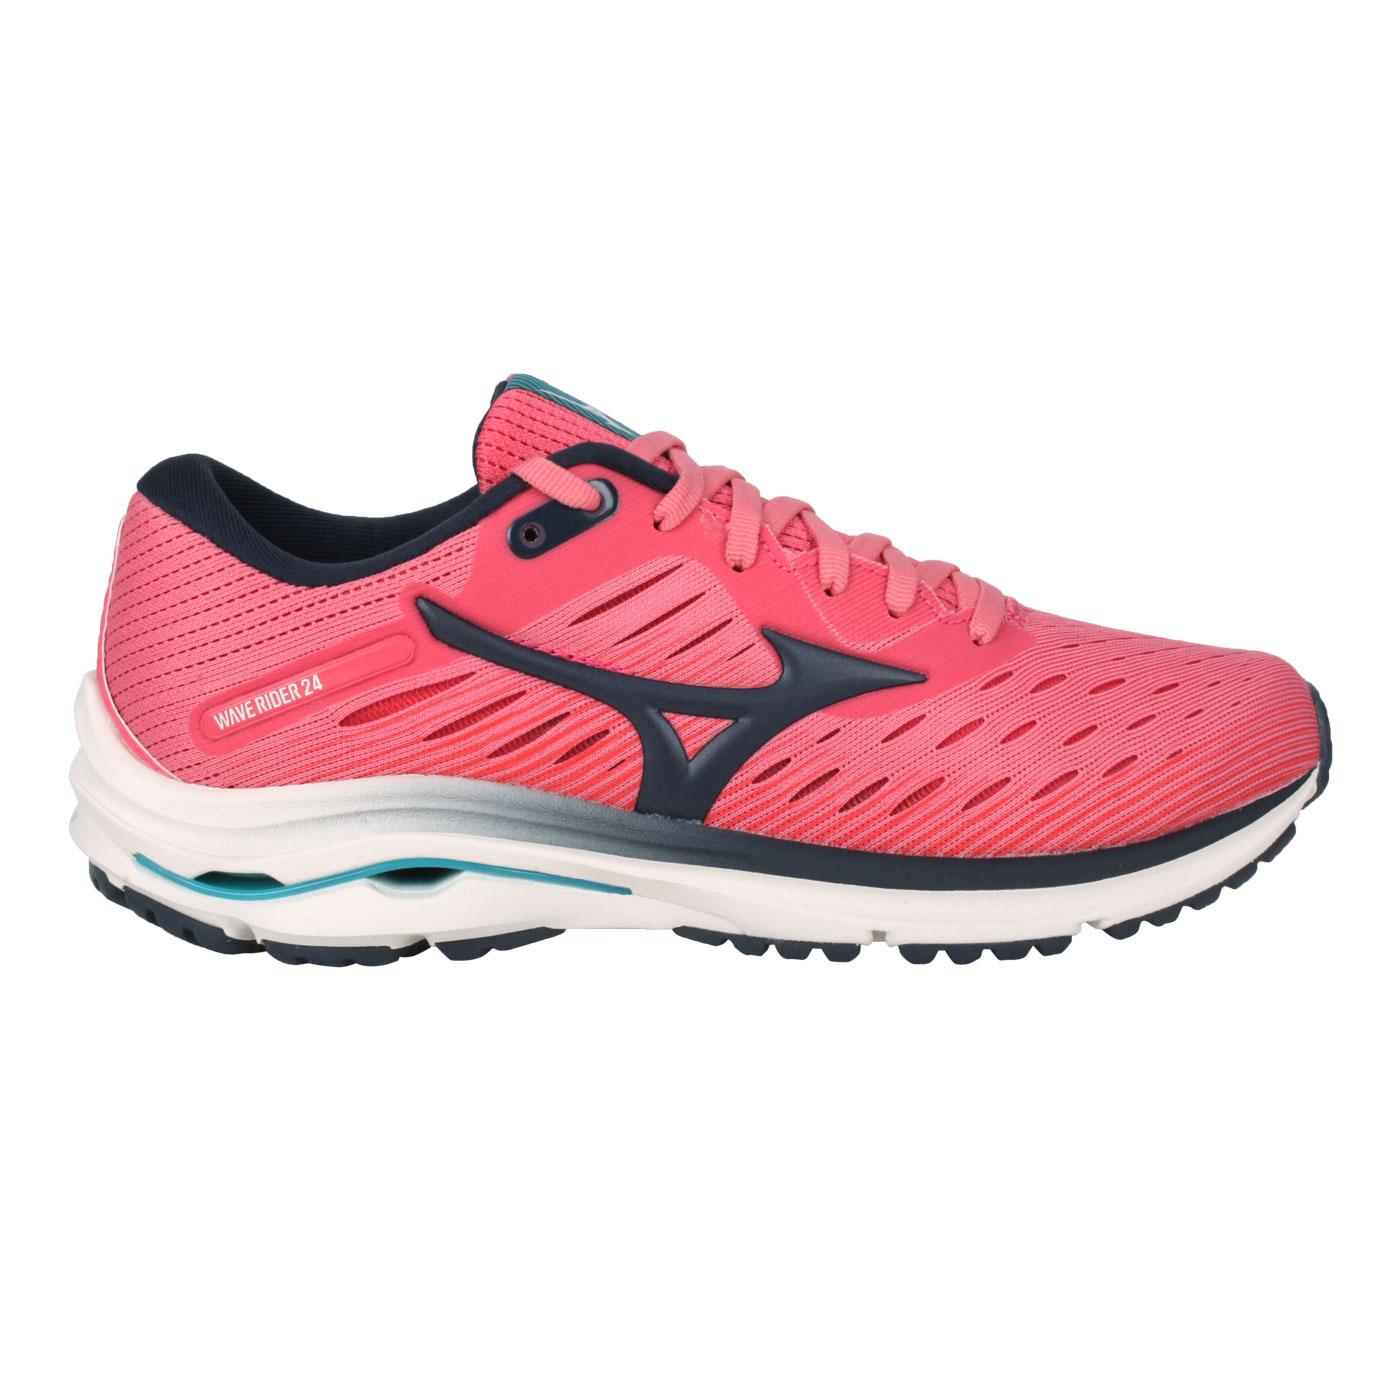 MIZUNO 女款慢跑鞋  @WAVE RIDER 24@J1GD200330 - 粉紅黑